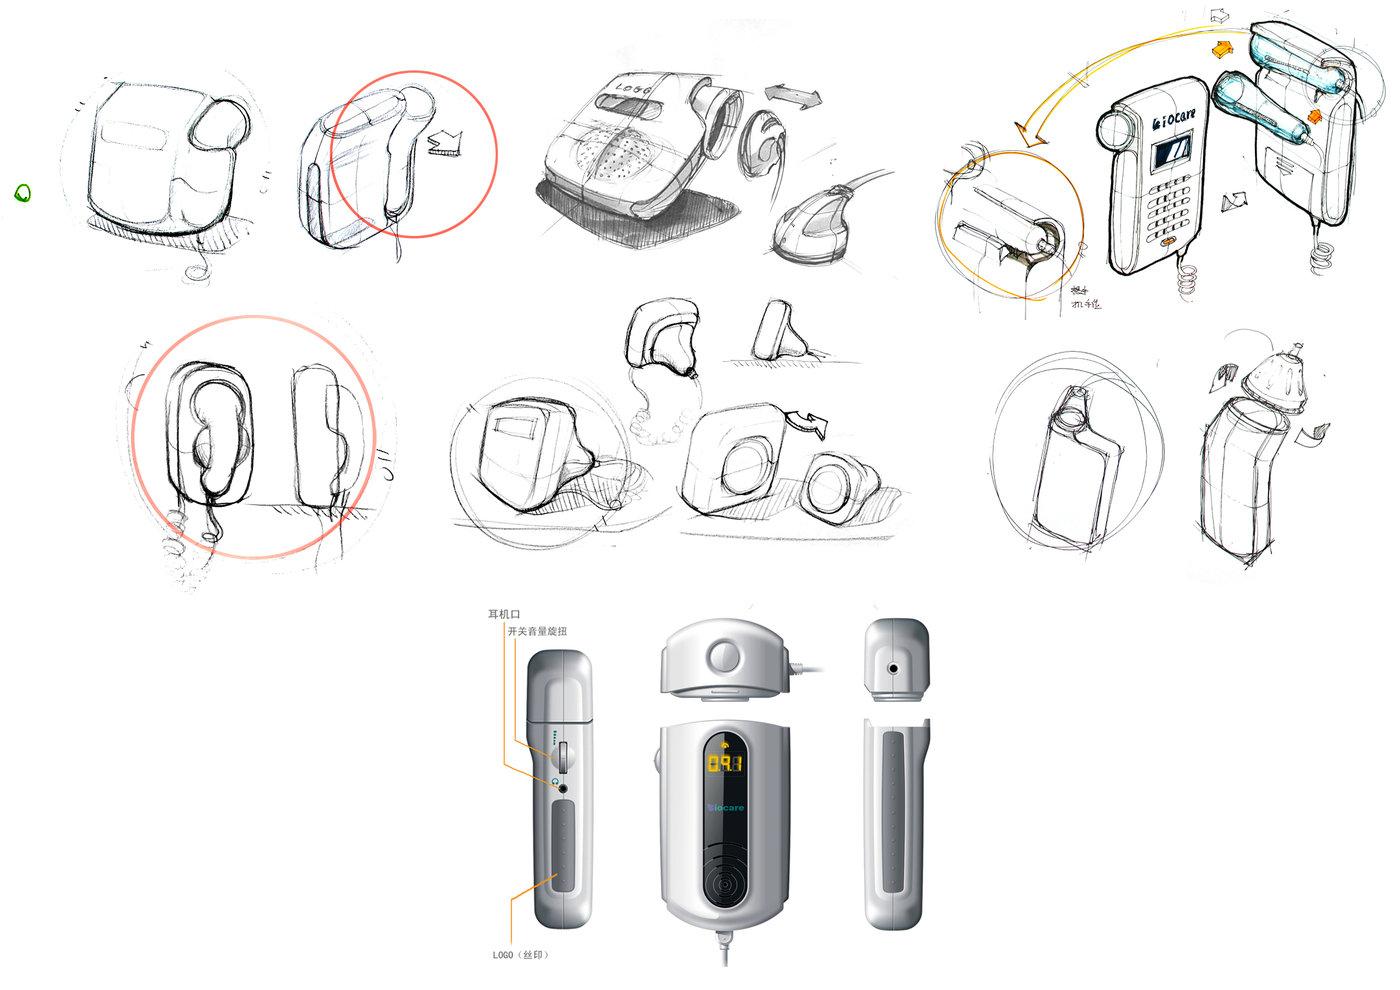 Medical Products by Newsun Guan at Coroflot.com